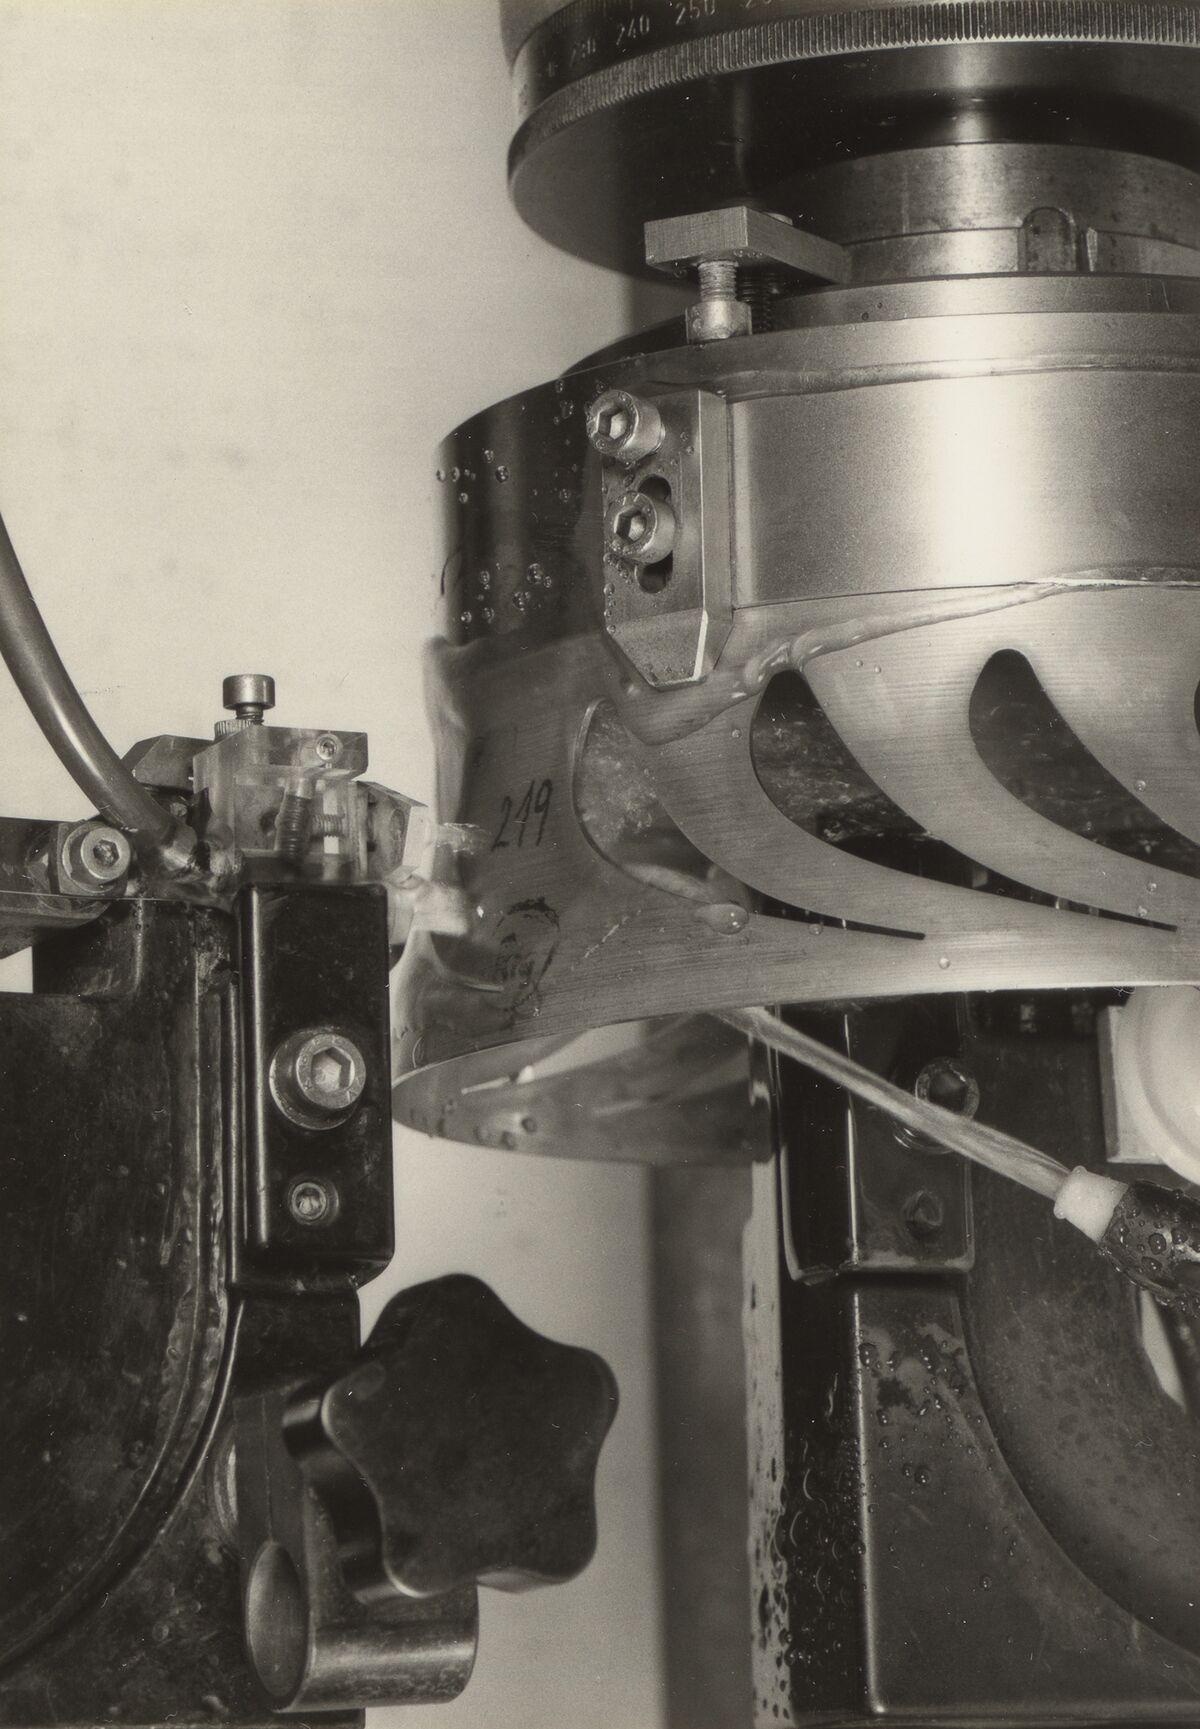 GFA 42/39054: Stator element for turbine production